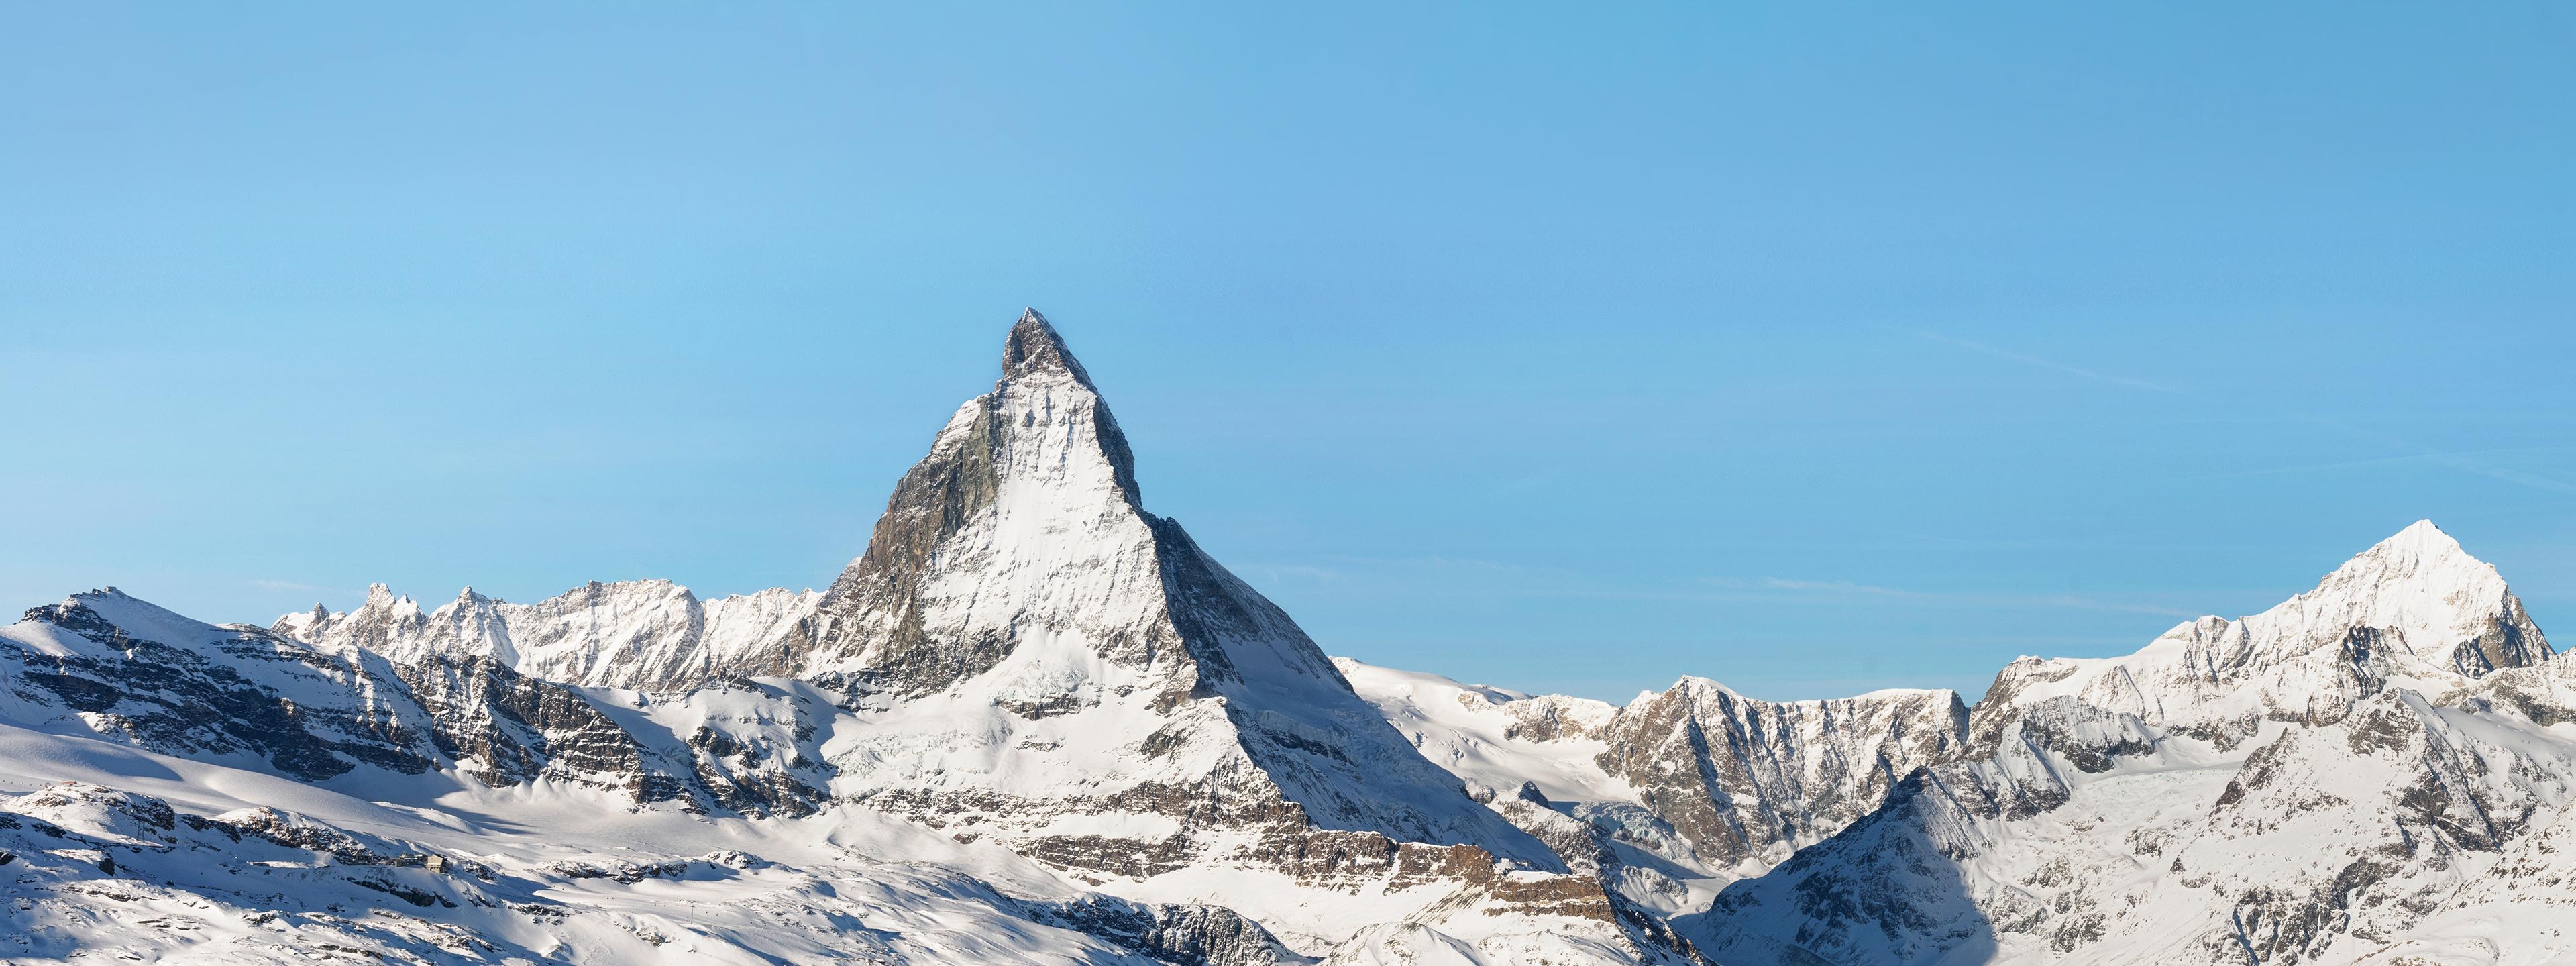 BRITA visie besneeuwde bergtoppen